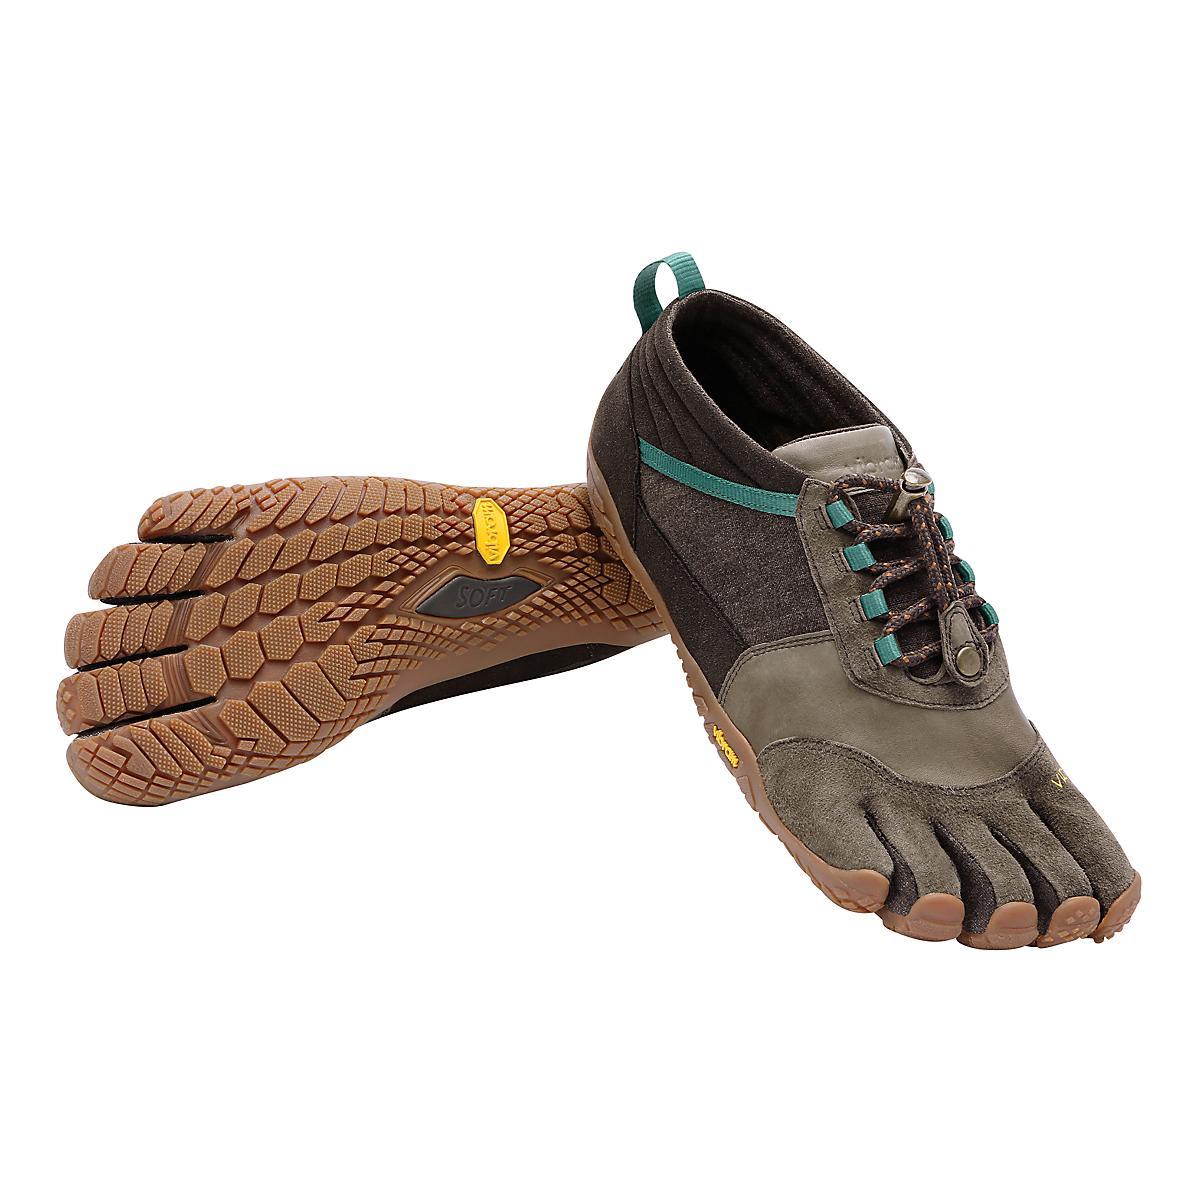 220a479b8549 Womens Vibram FiveFingers Trek Ascent LR Trail Running Shoe at Road Runner  Sports